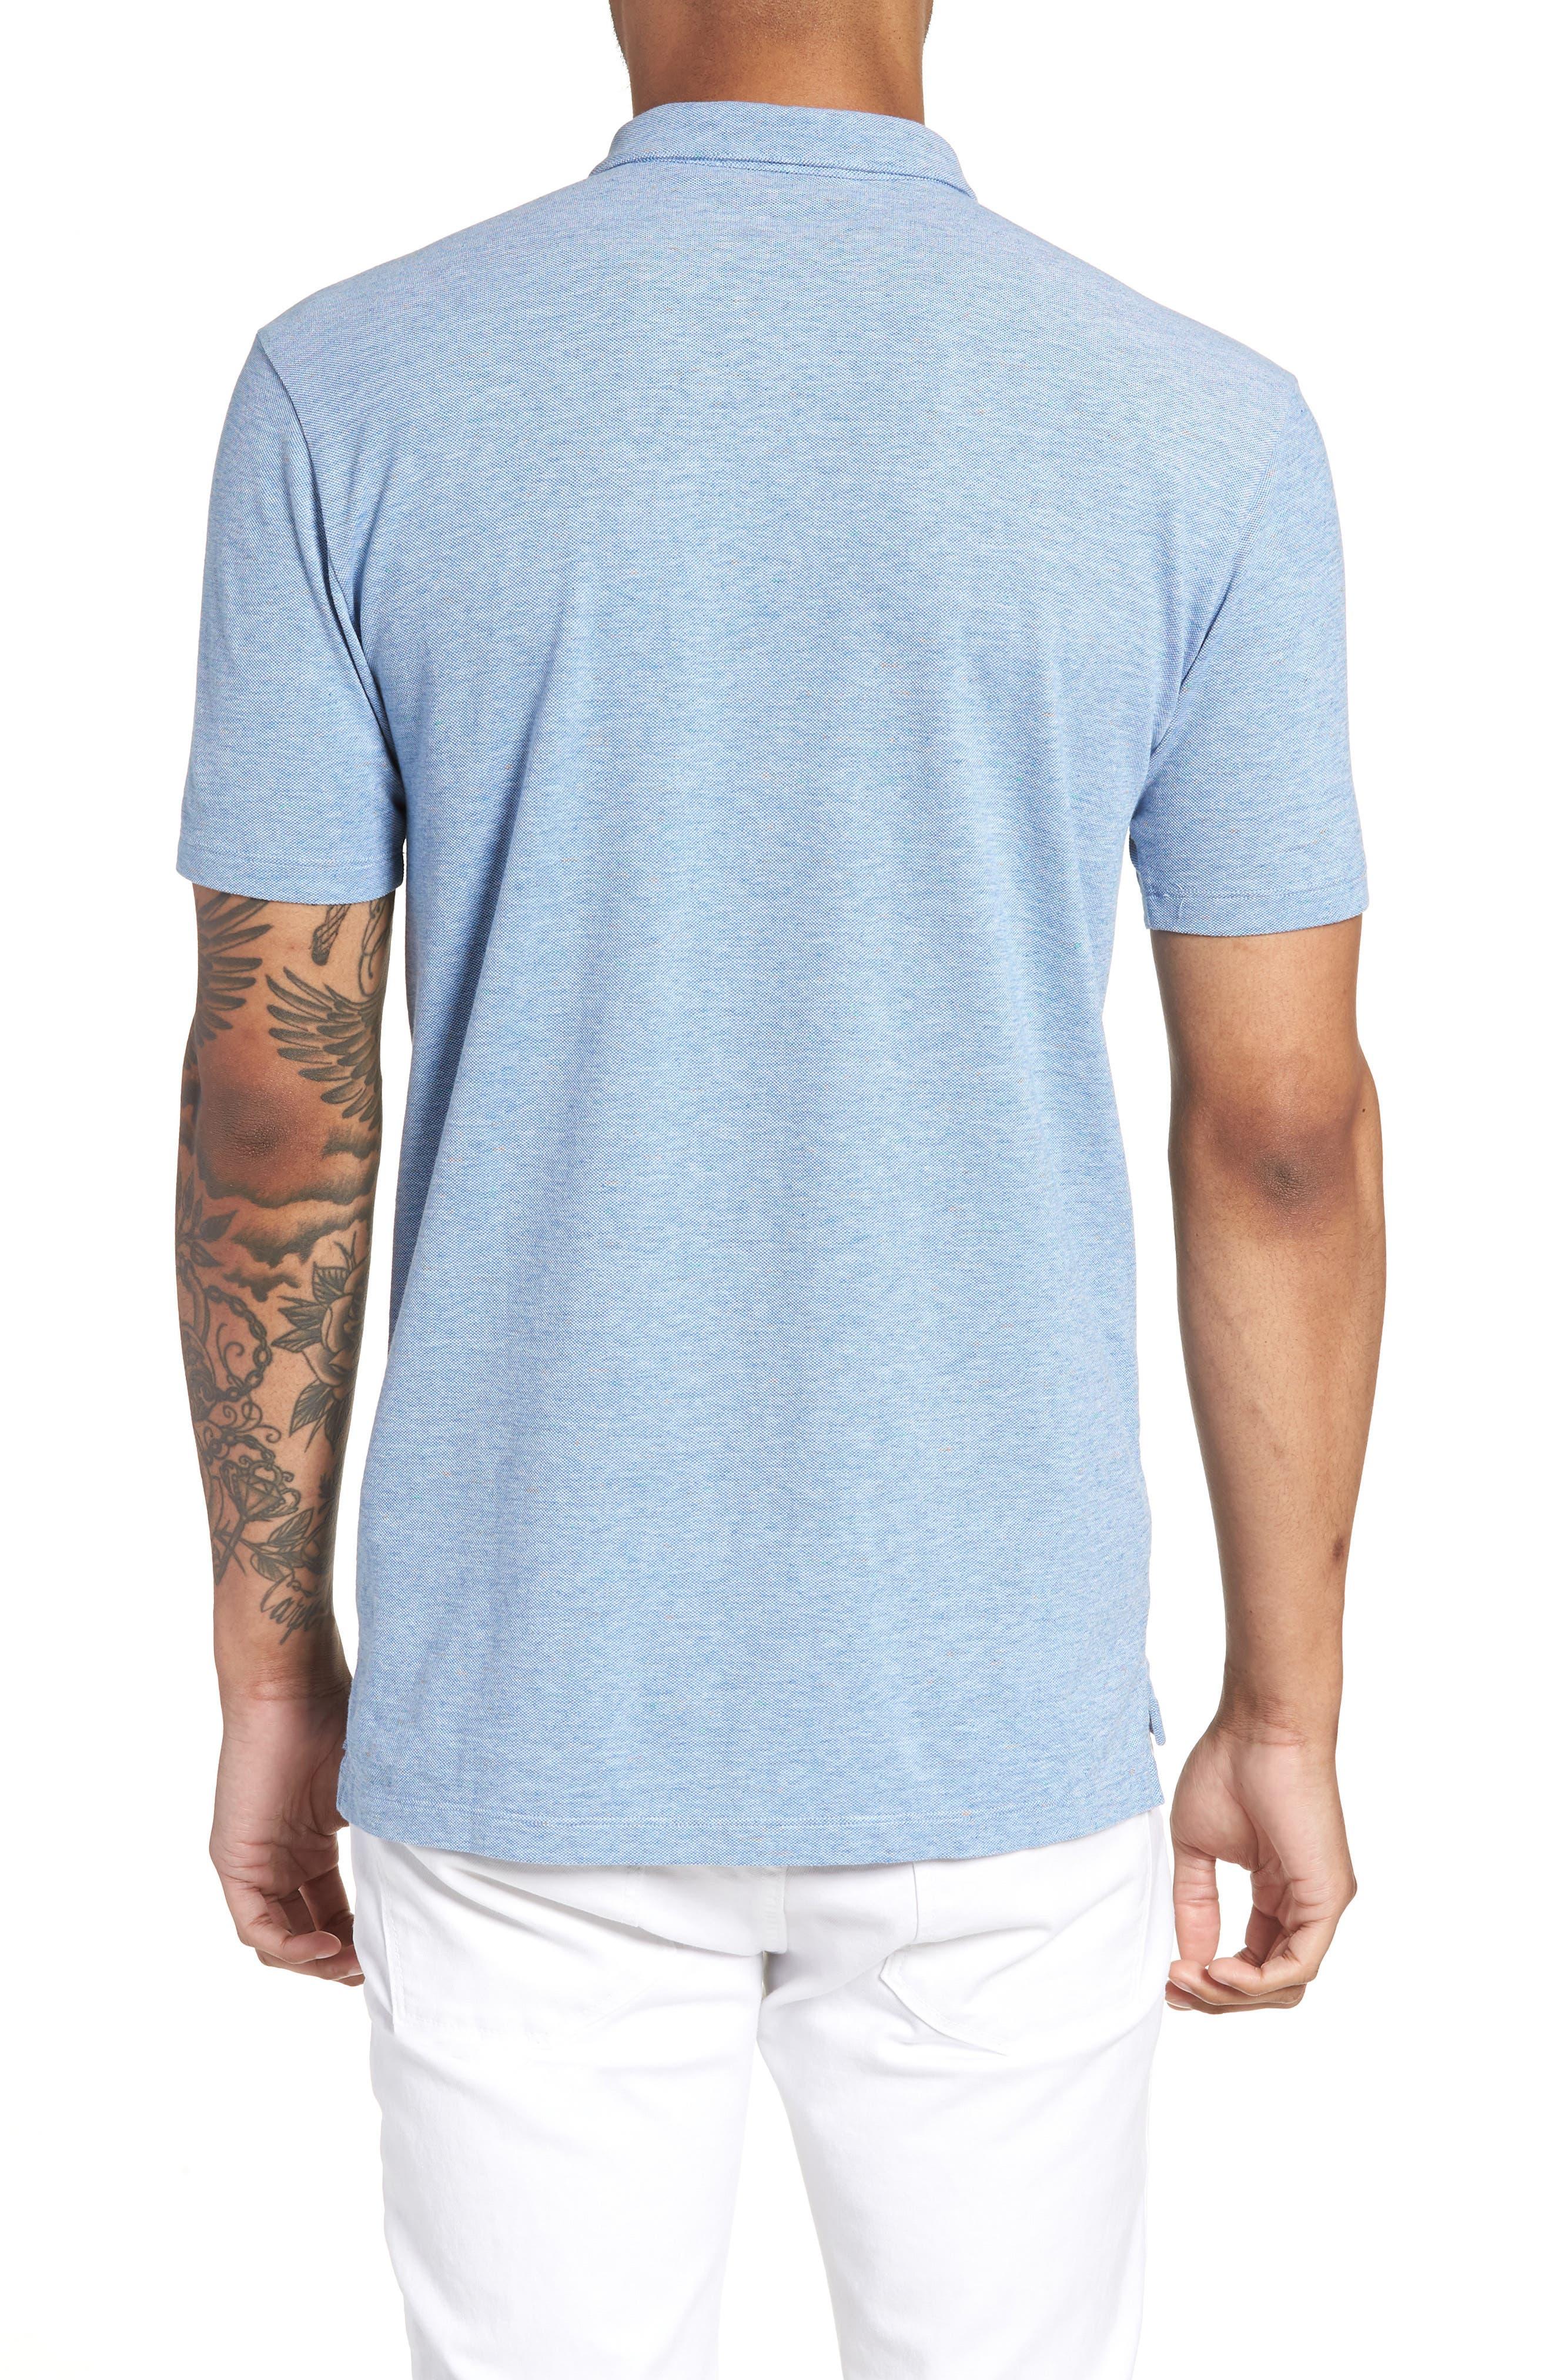 Darrow Cotton Polo Shirt,                             Alternate thumbnail 2, color,                             Blue